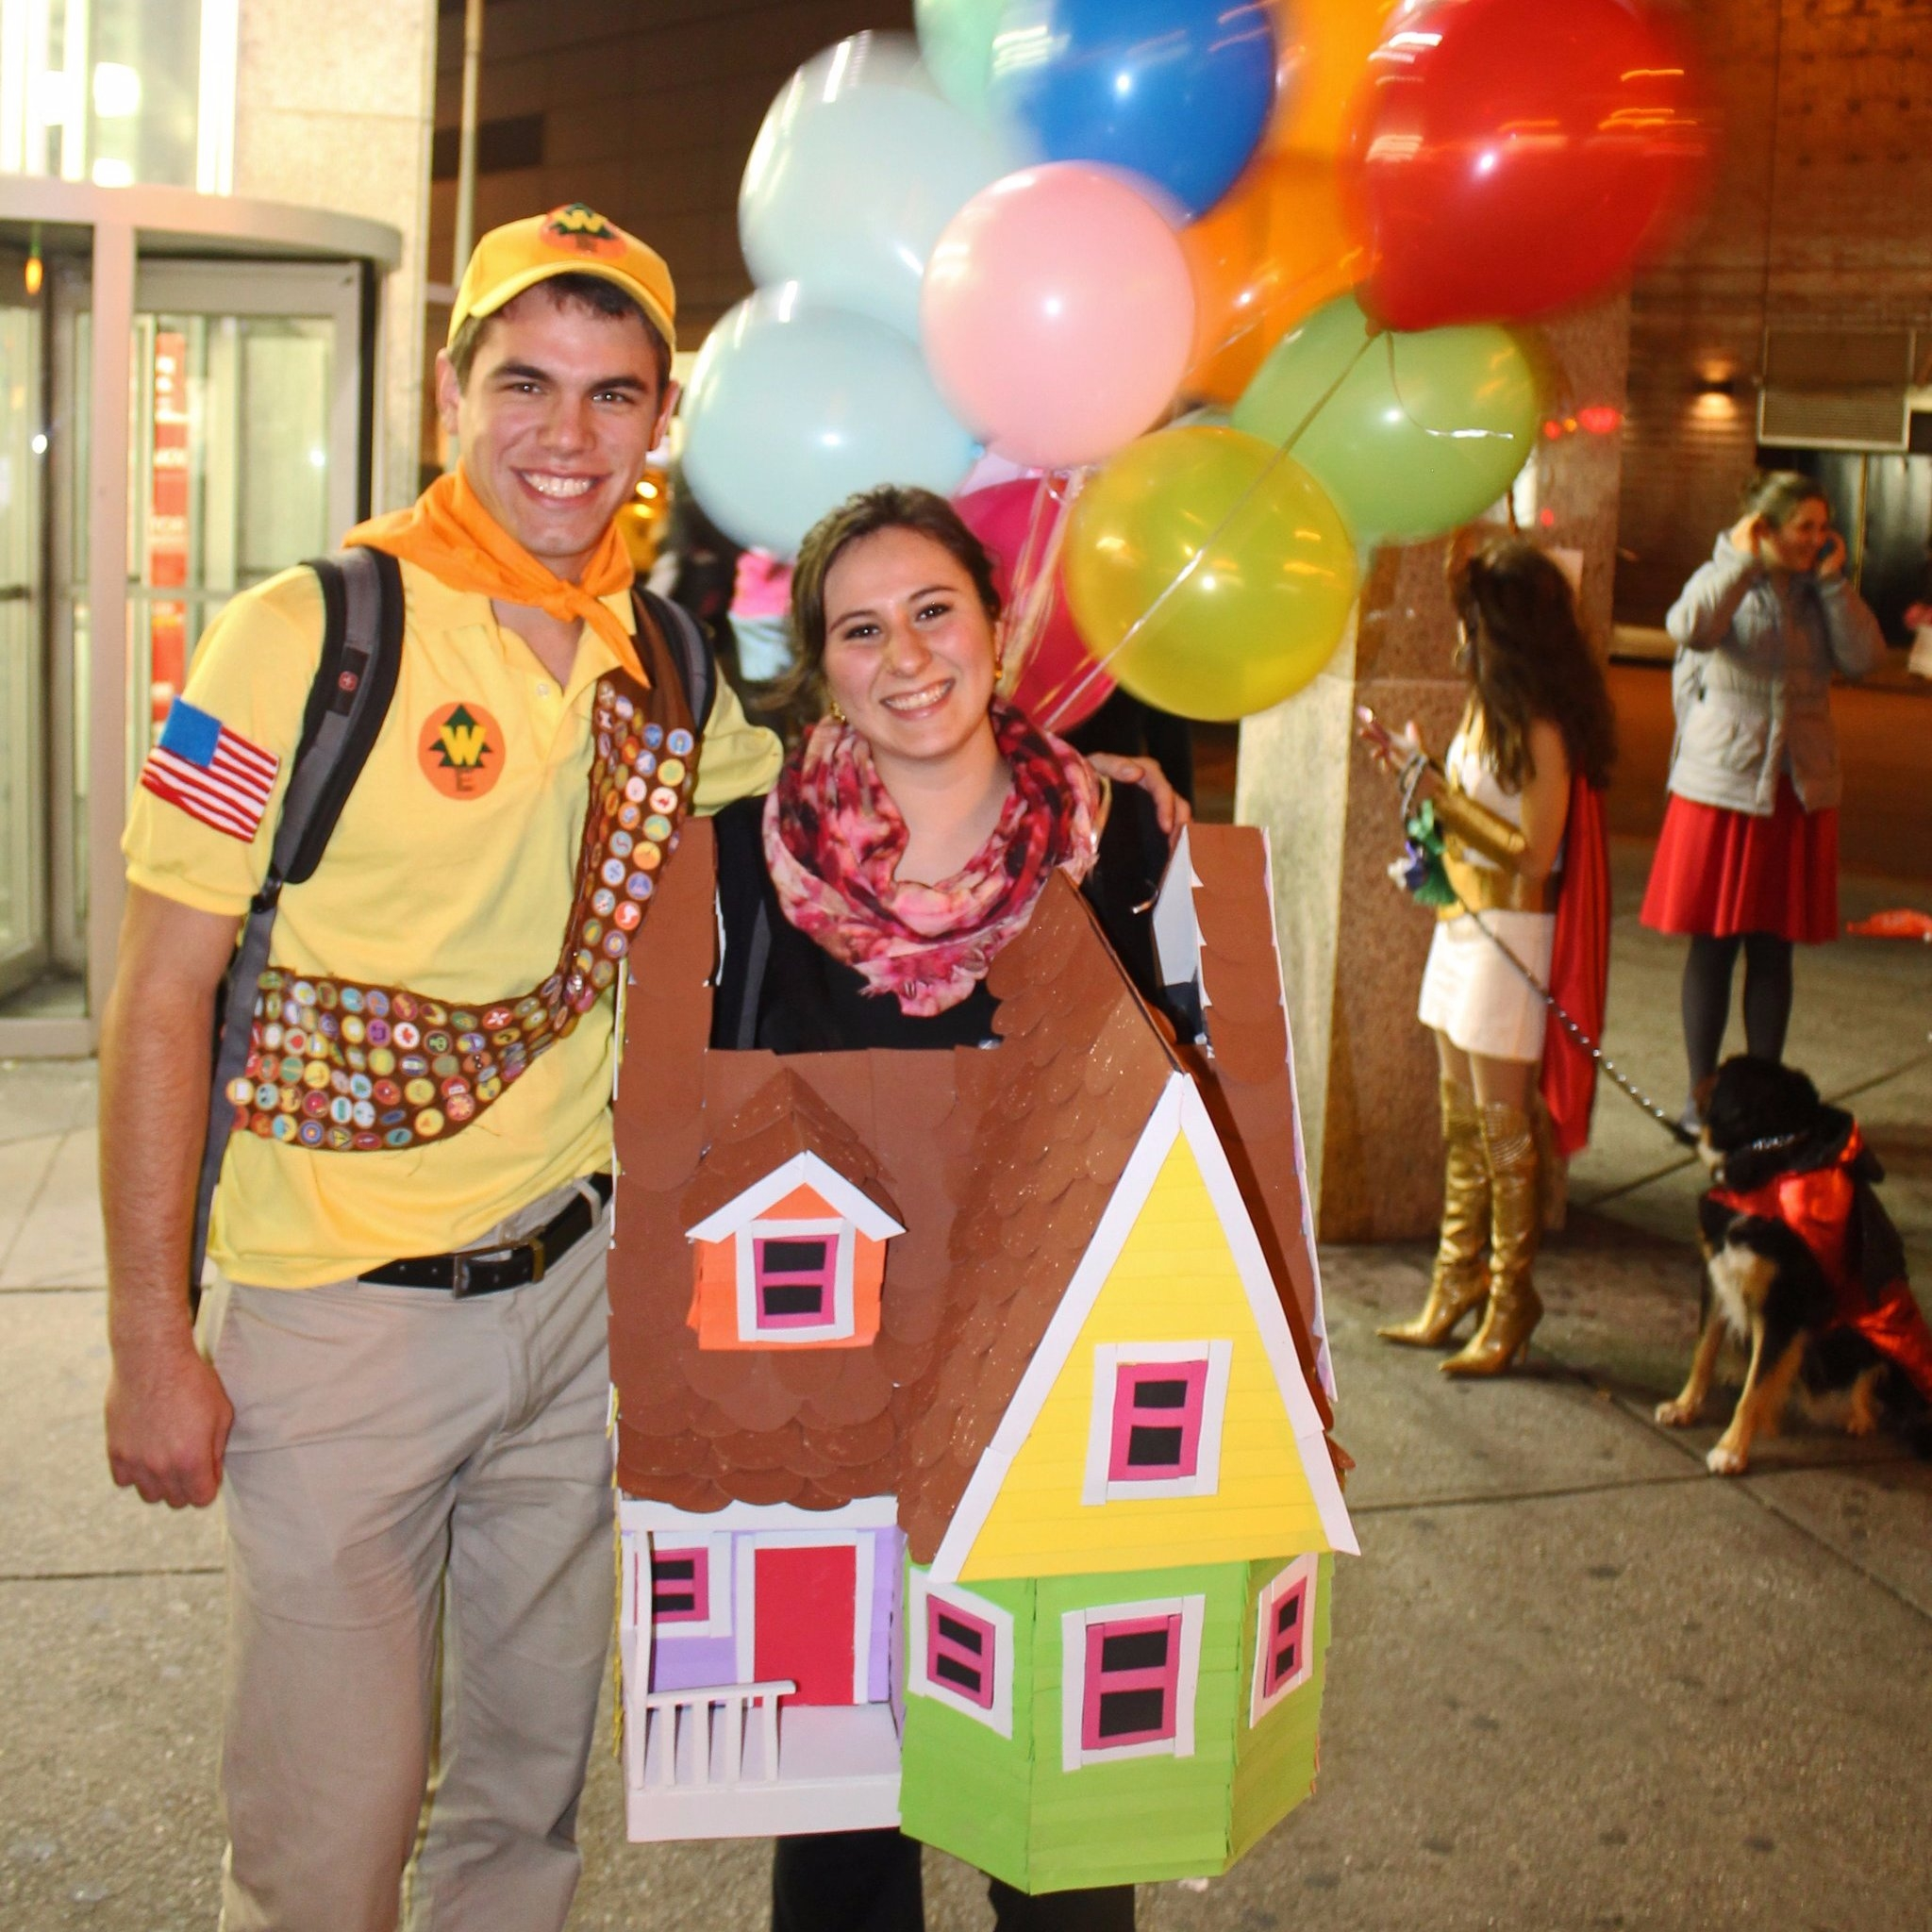 10 Unique Best Couple Halloween Costumes Ideas cheap diy couples halloween costumes popsugar smart living 8 2020